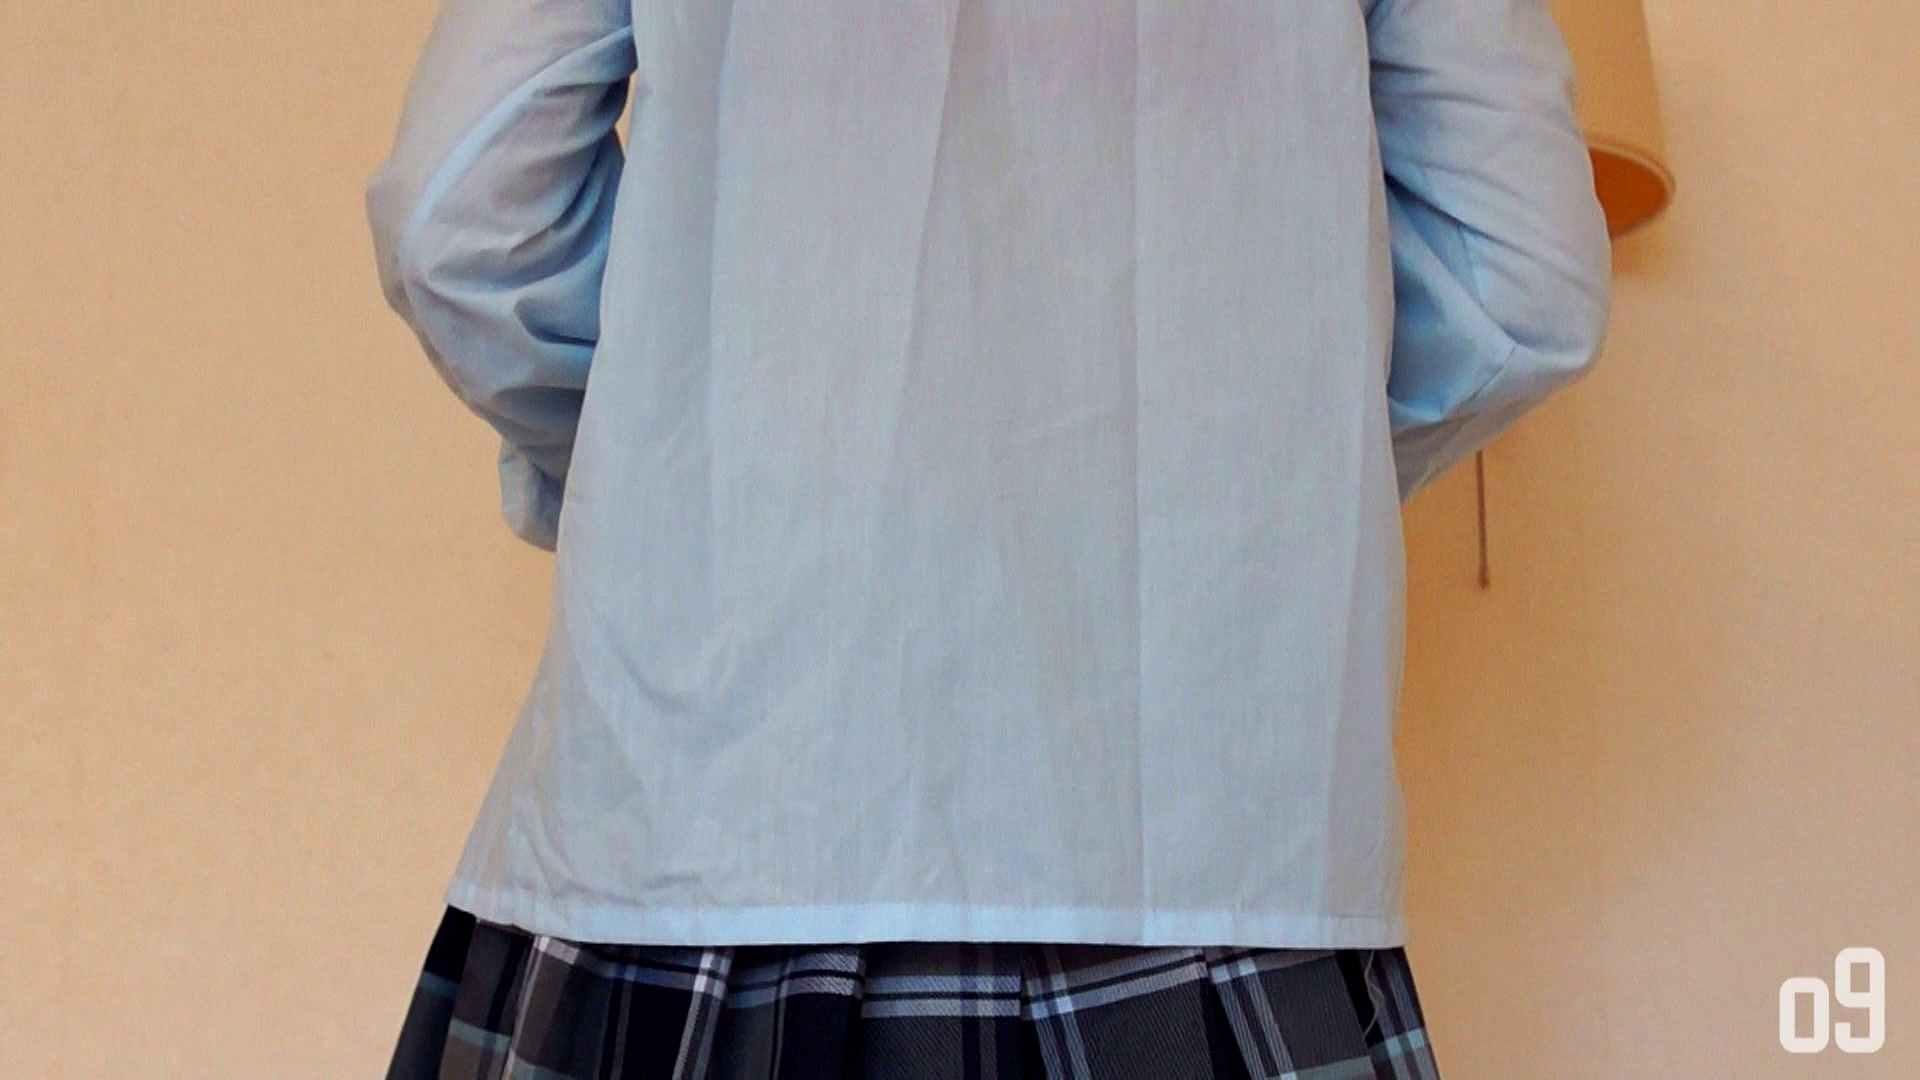 vol.2 制服に着替えてもらいました。 制服JK | 美女OL  97連発 55